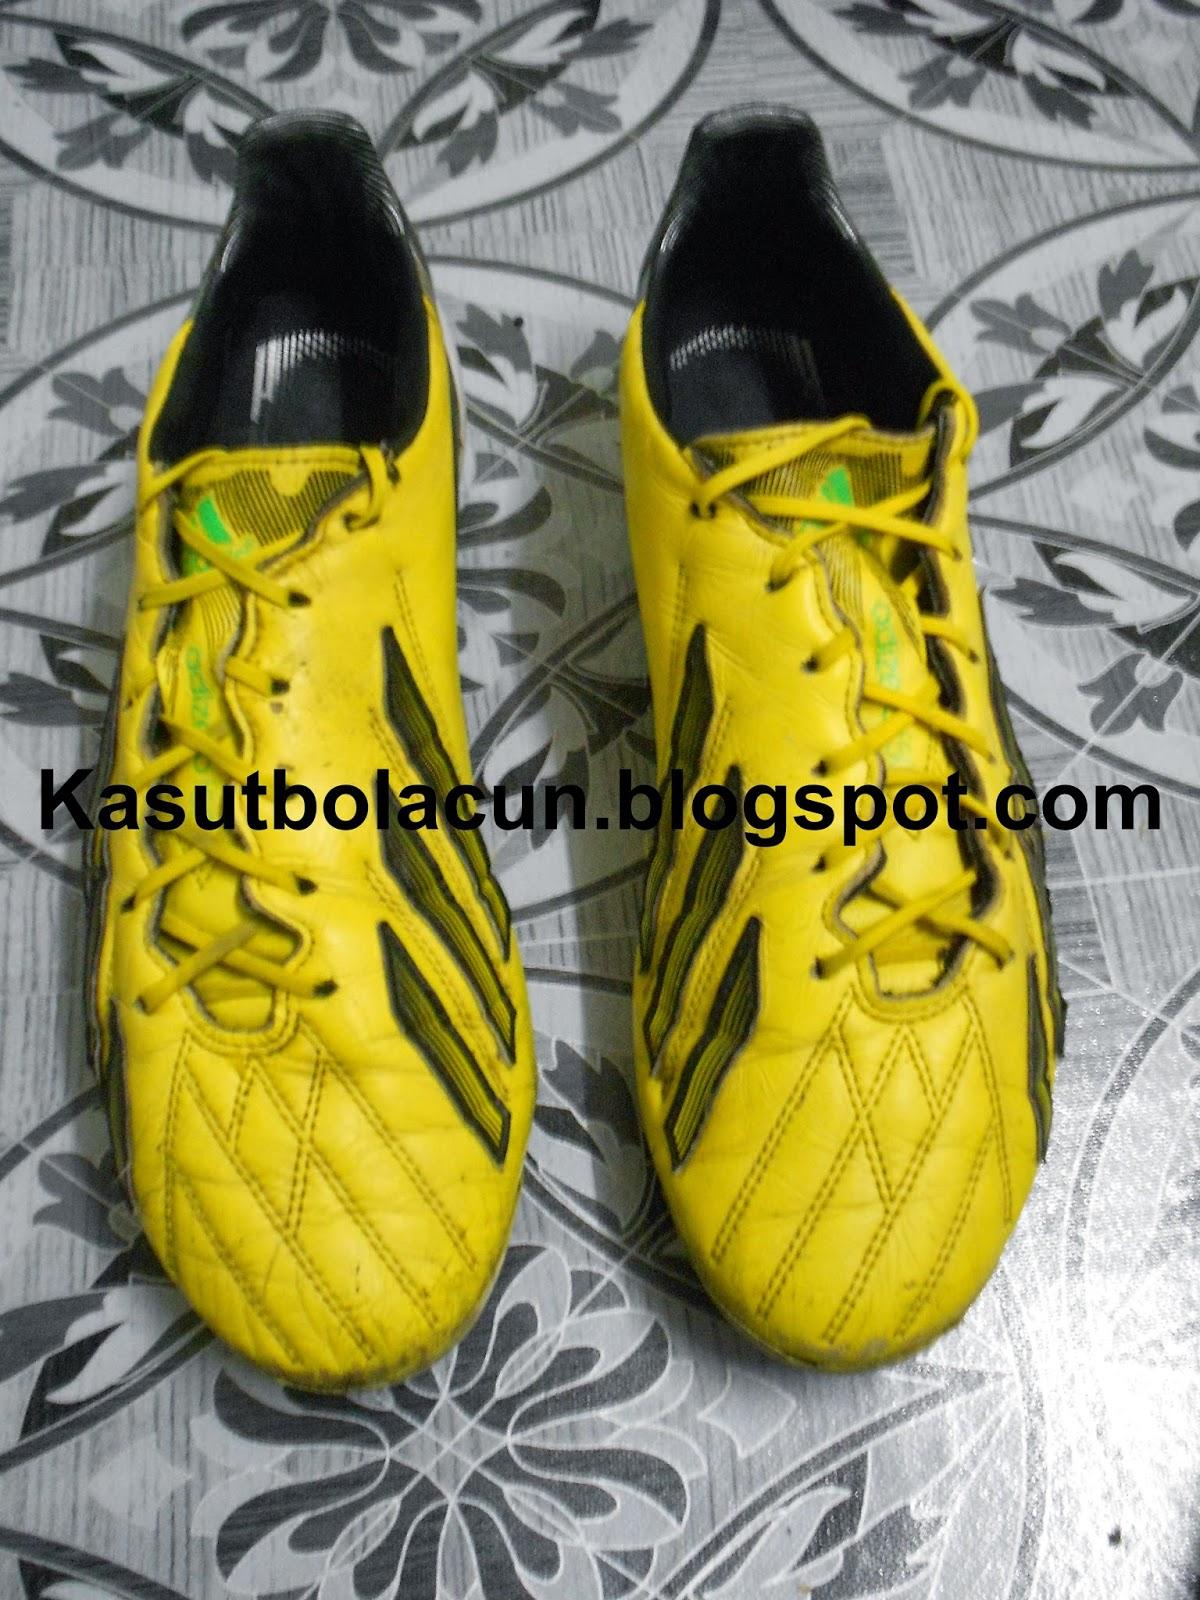 http://kasutbolacun.blogspot.com/2015/02/adidas-f50-adizero-micoach-2-fg_24.html